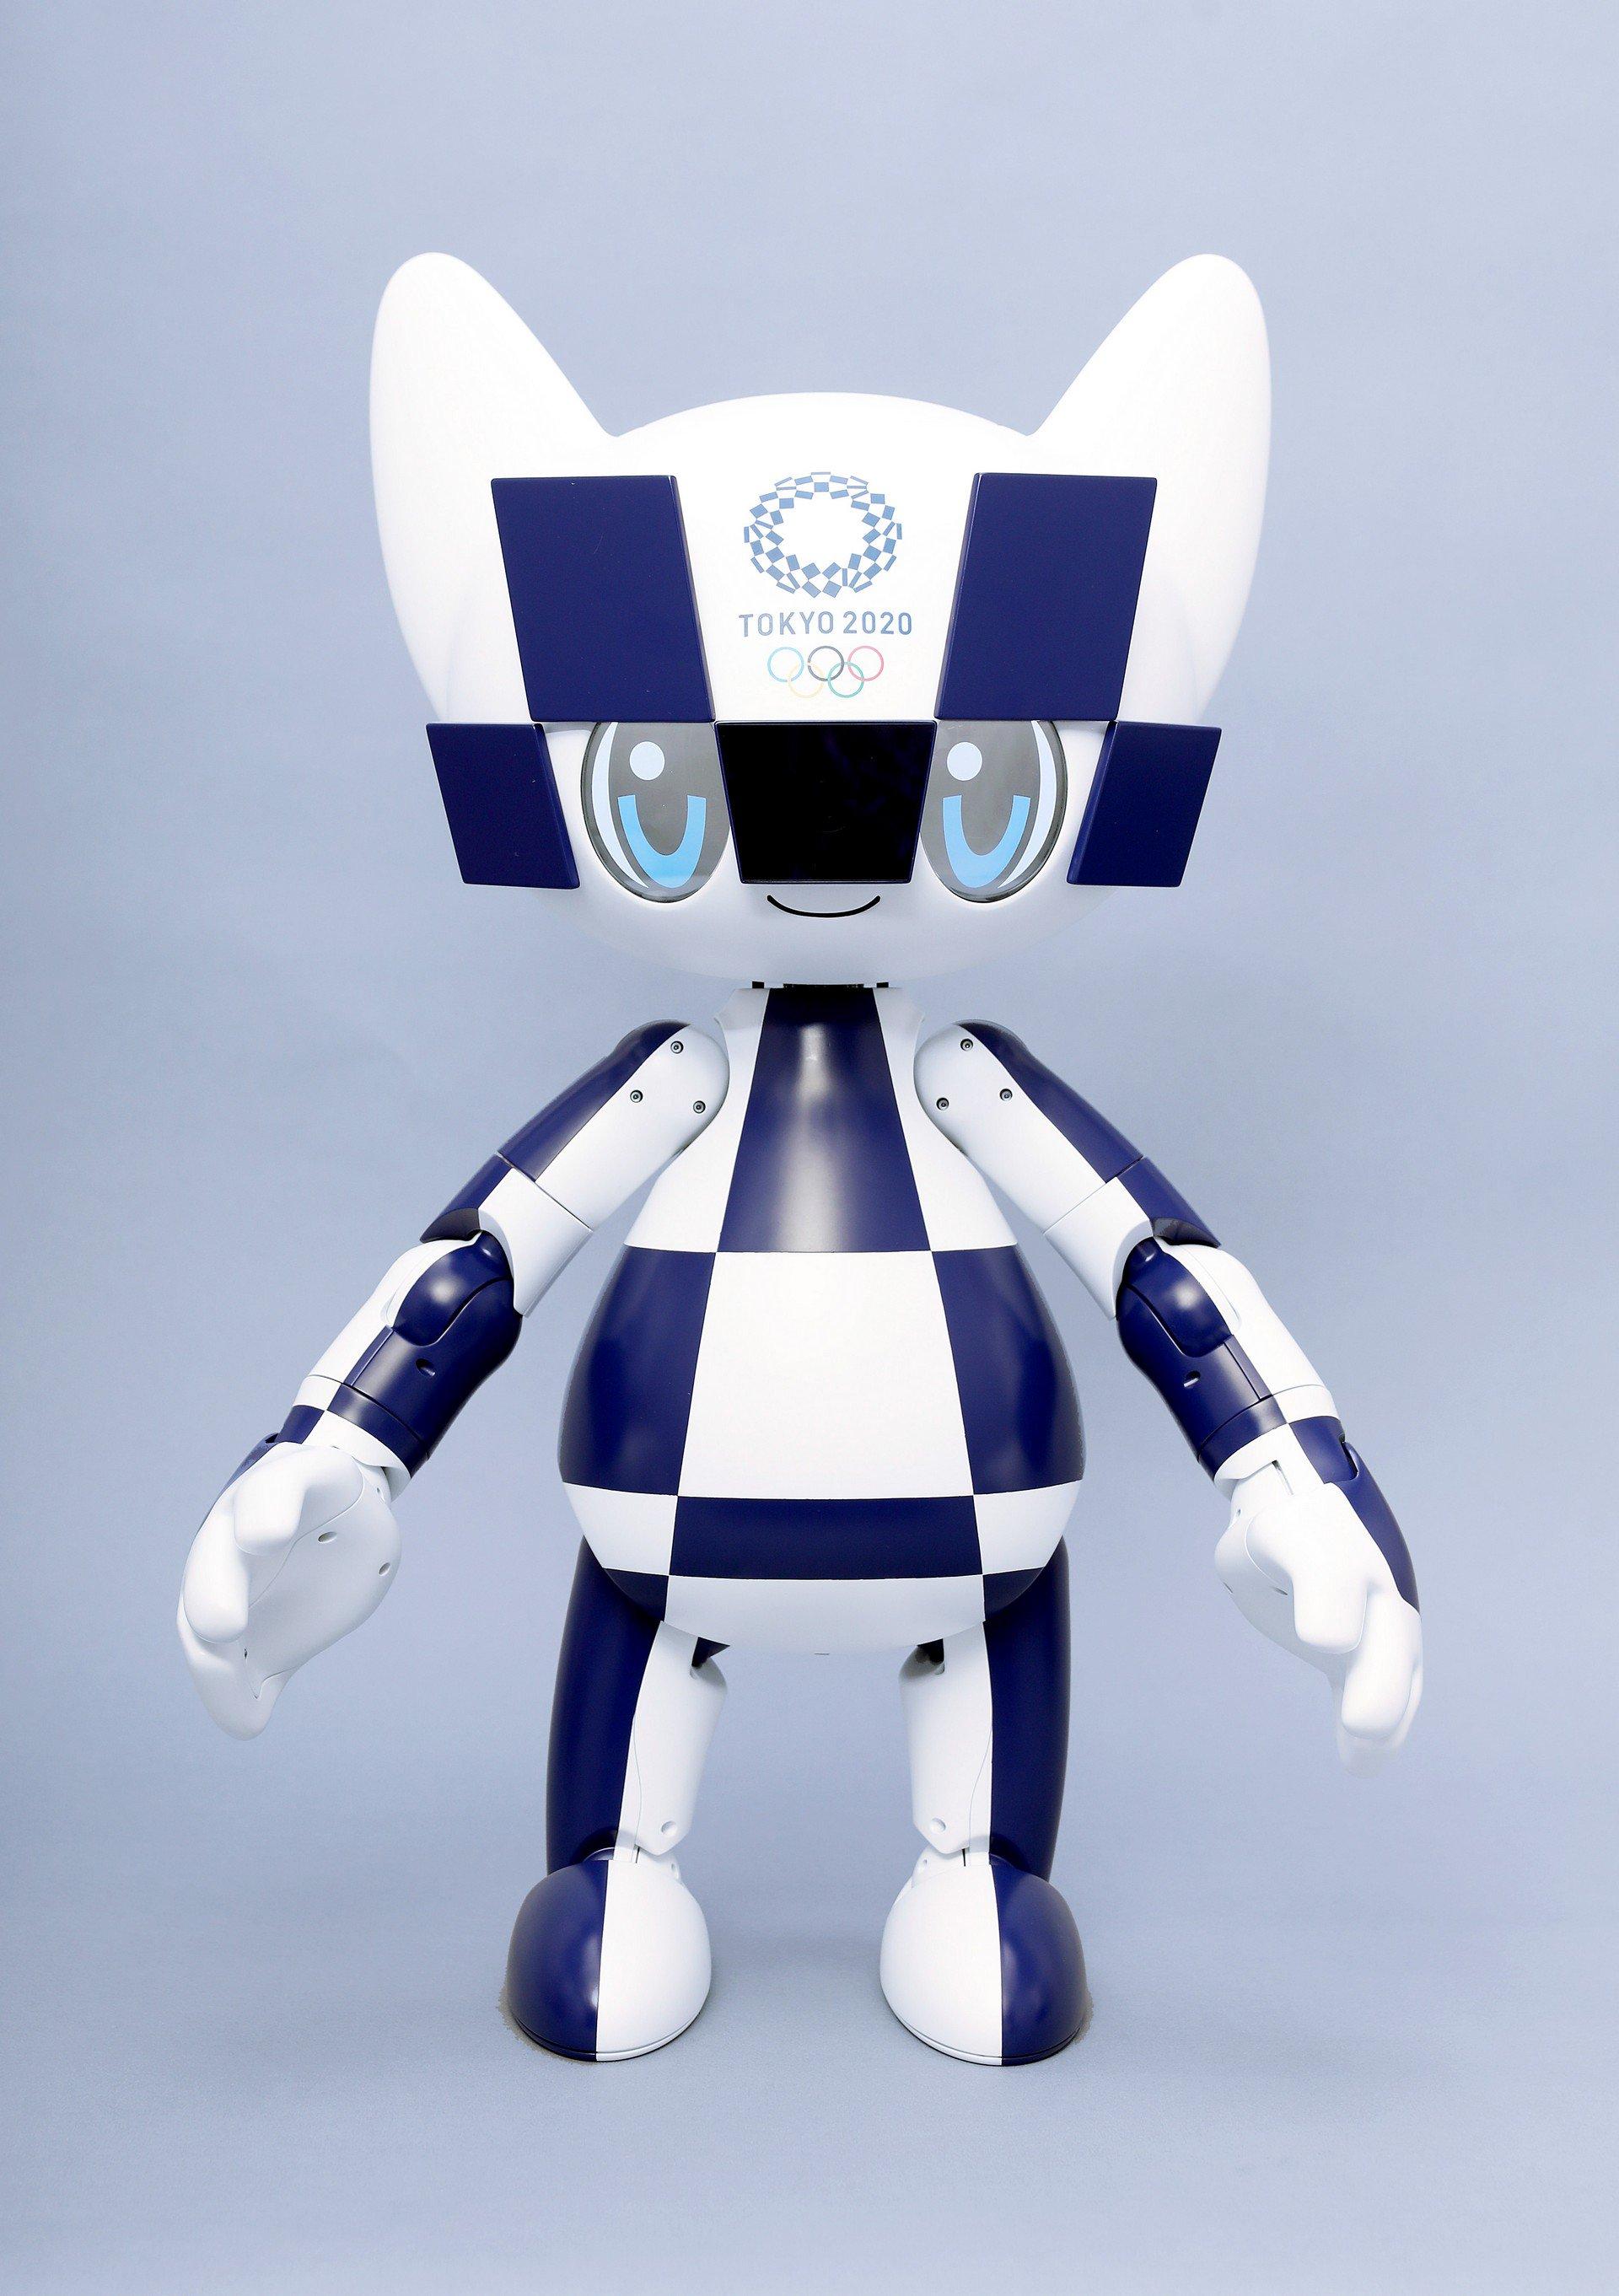 aa0f841e-toyota-robots-for-2020-olympics-4